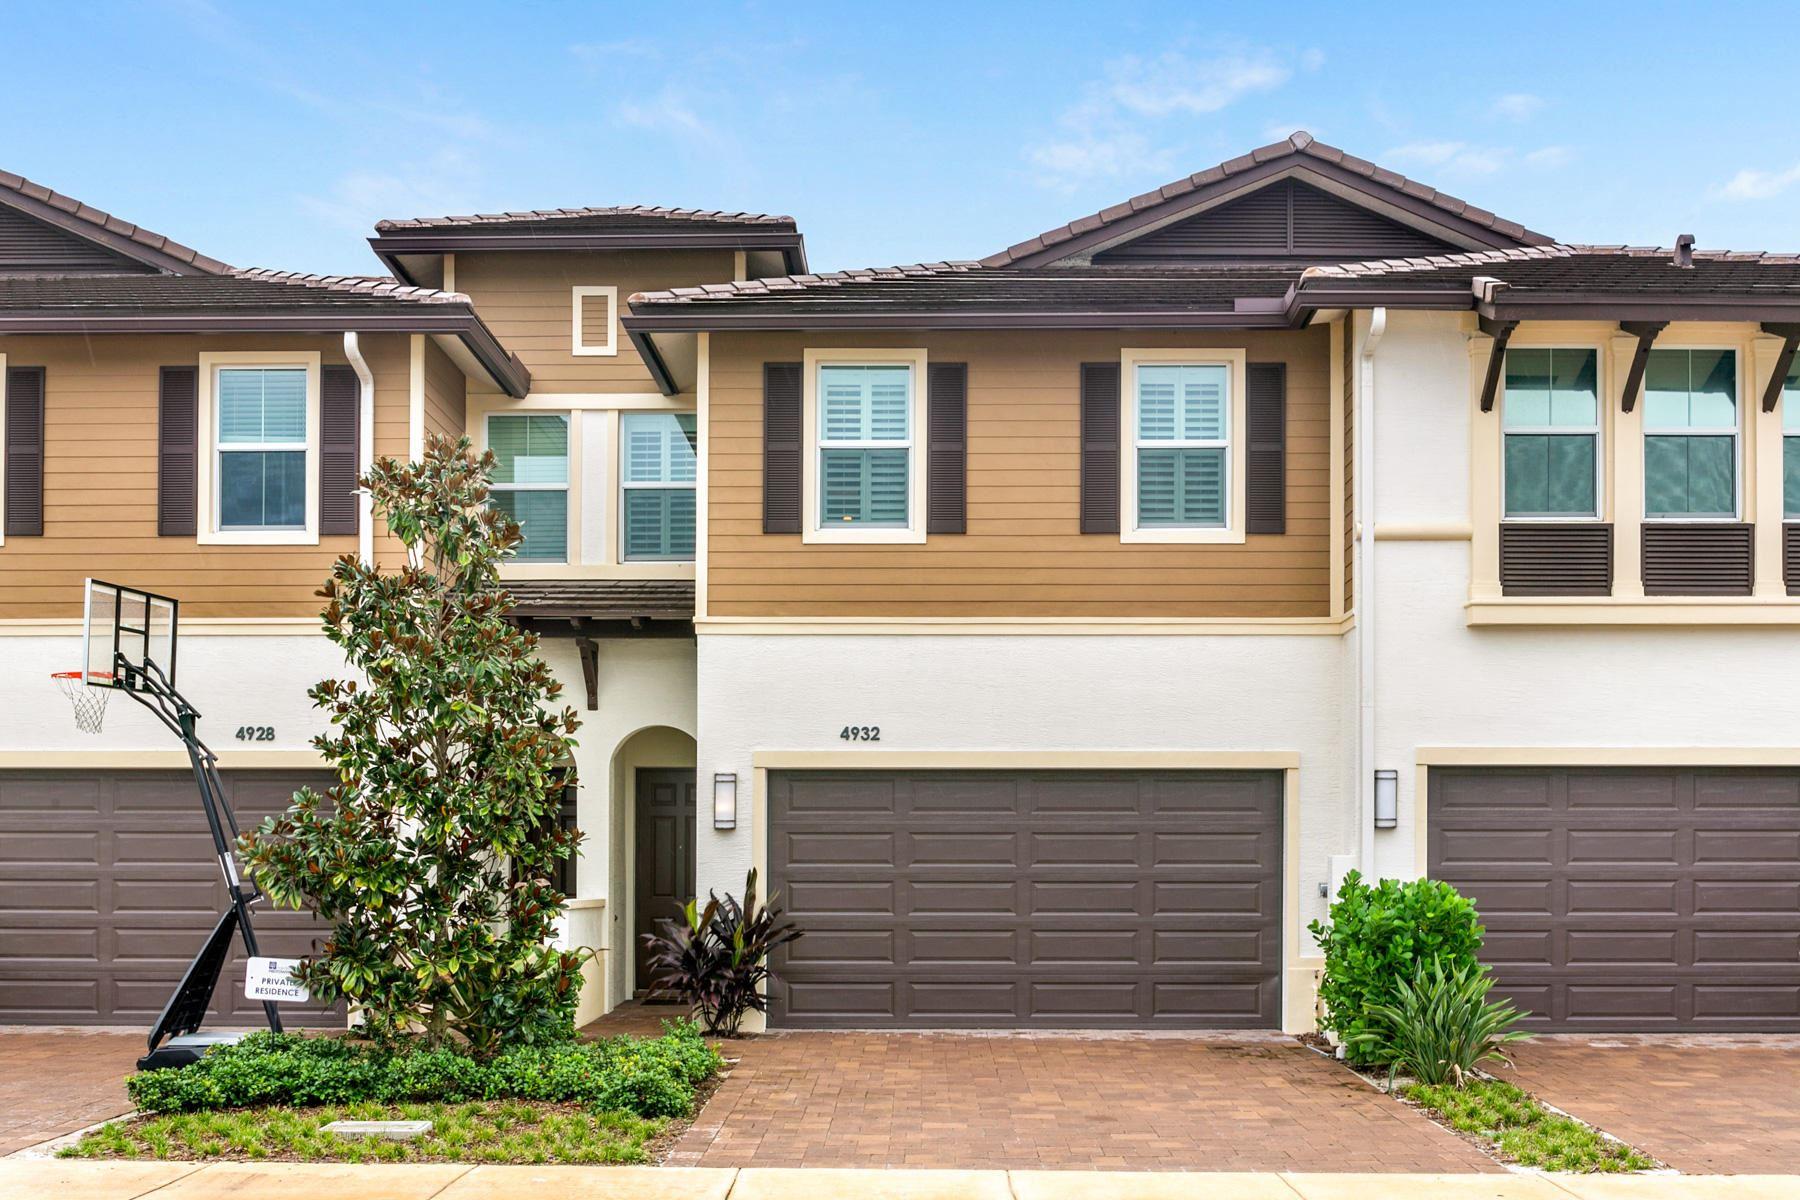 4932 Pointe Midtown Way Way, Palm Beach Gardens, FL 33418 - #: RX-10665516